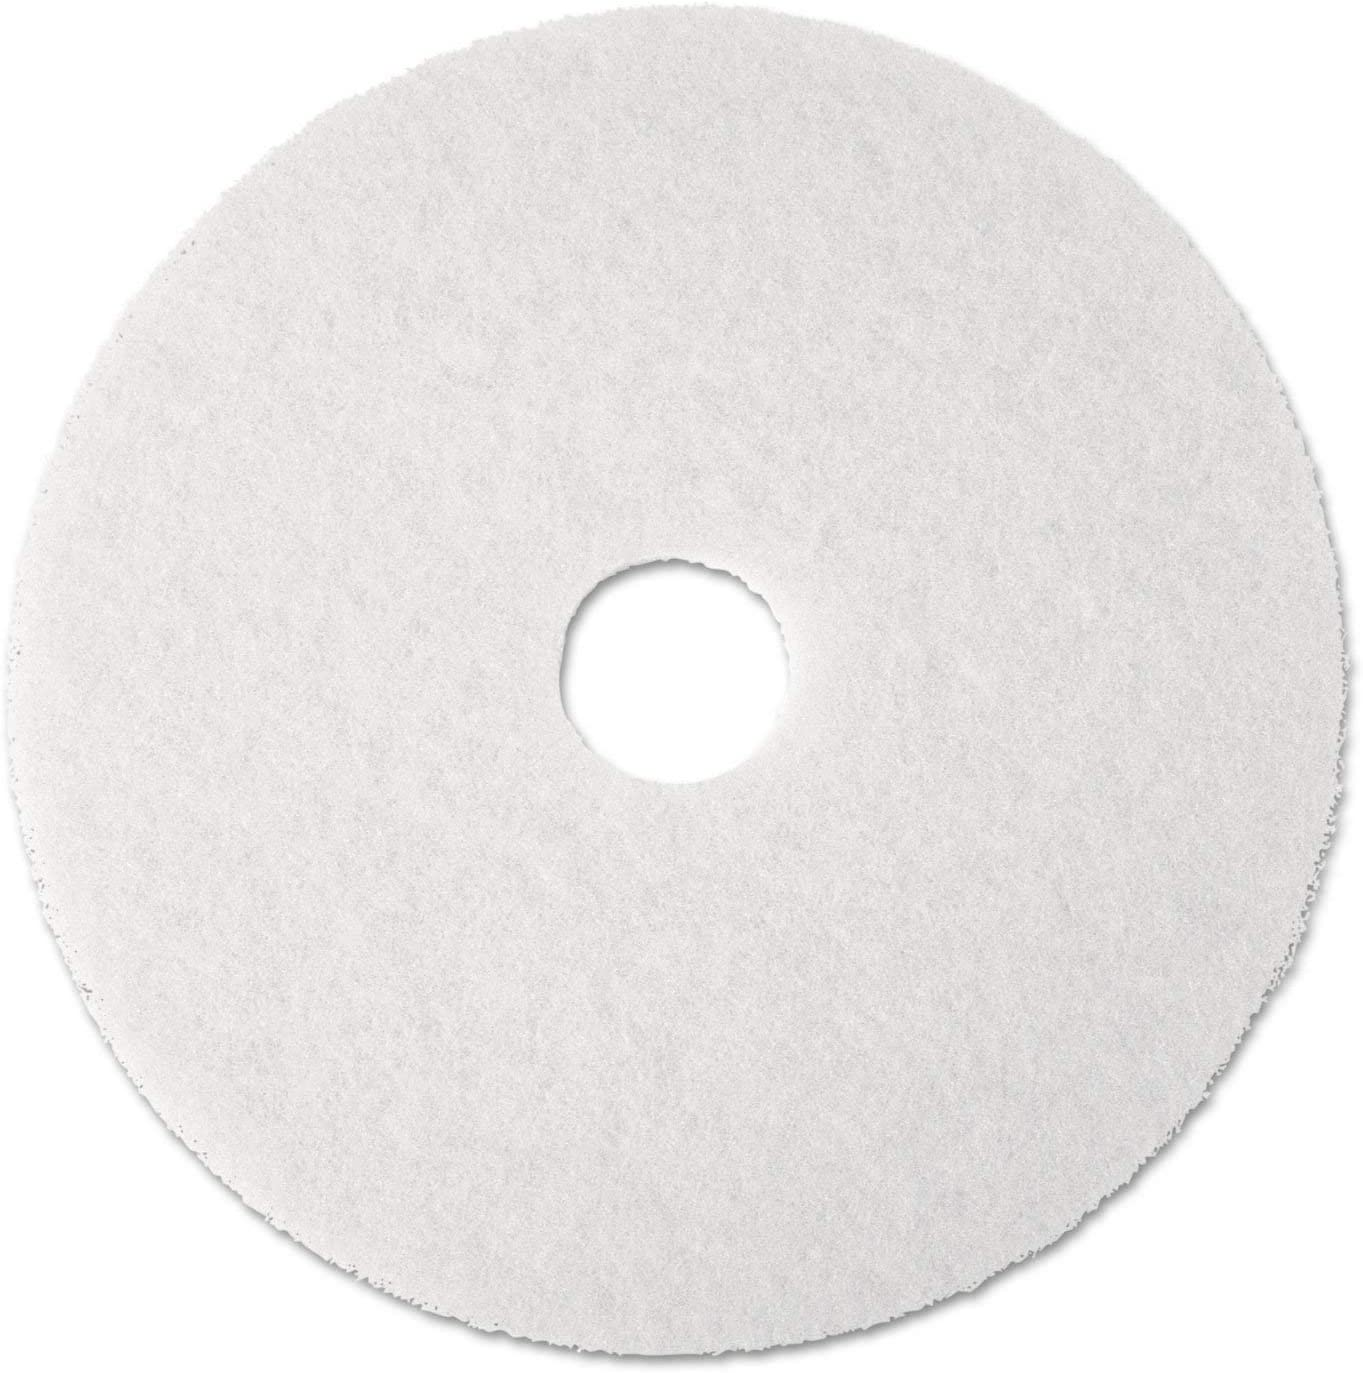 "3m 4100-20 Super Polish Floor Pad 20"" - White (Pack Of 5)"